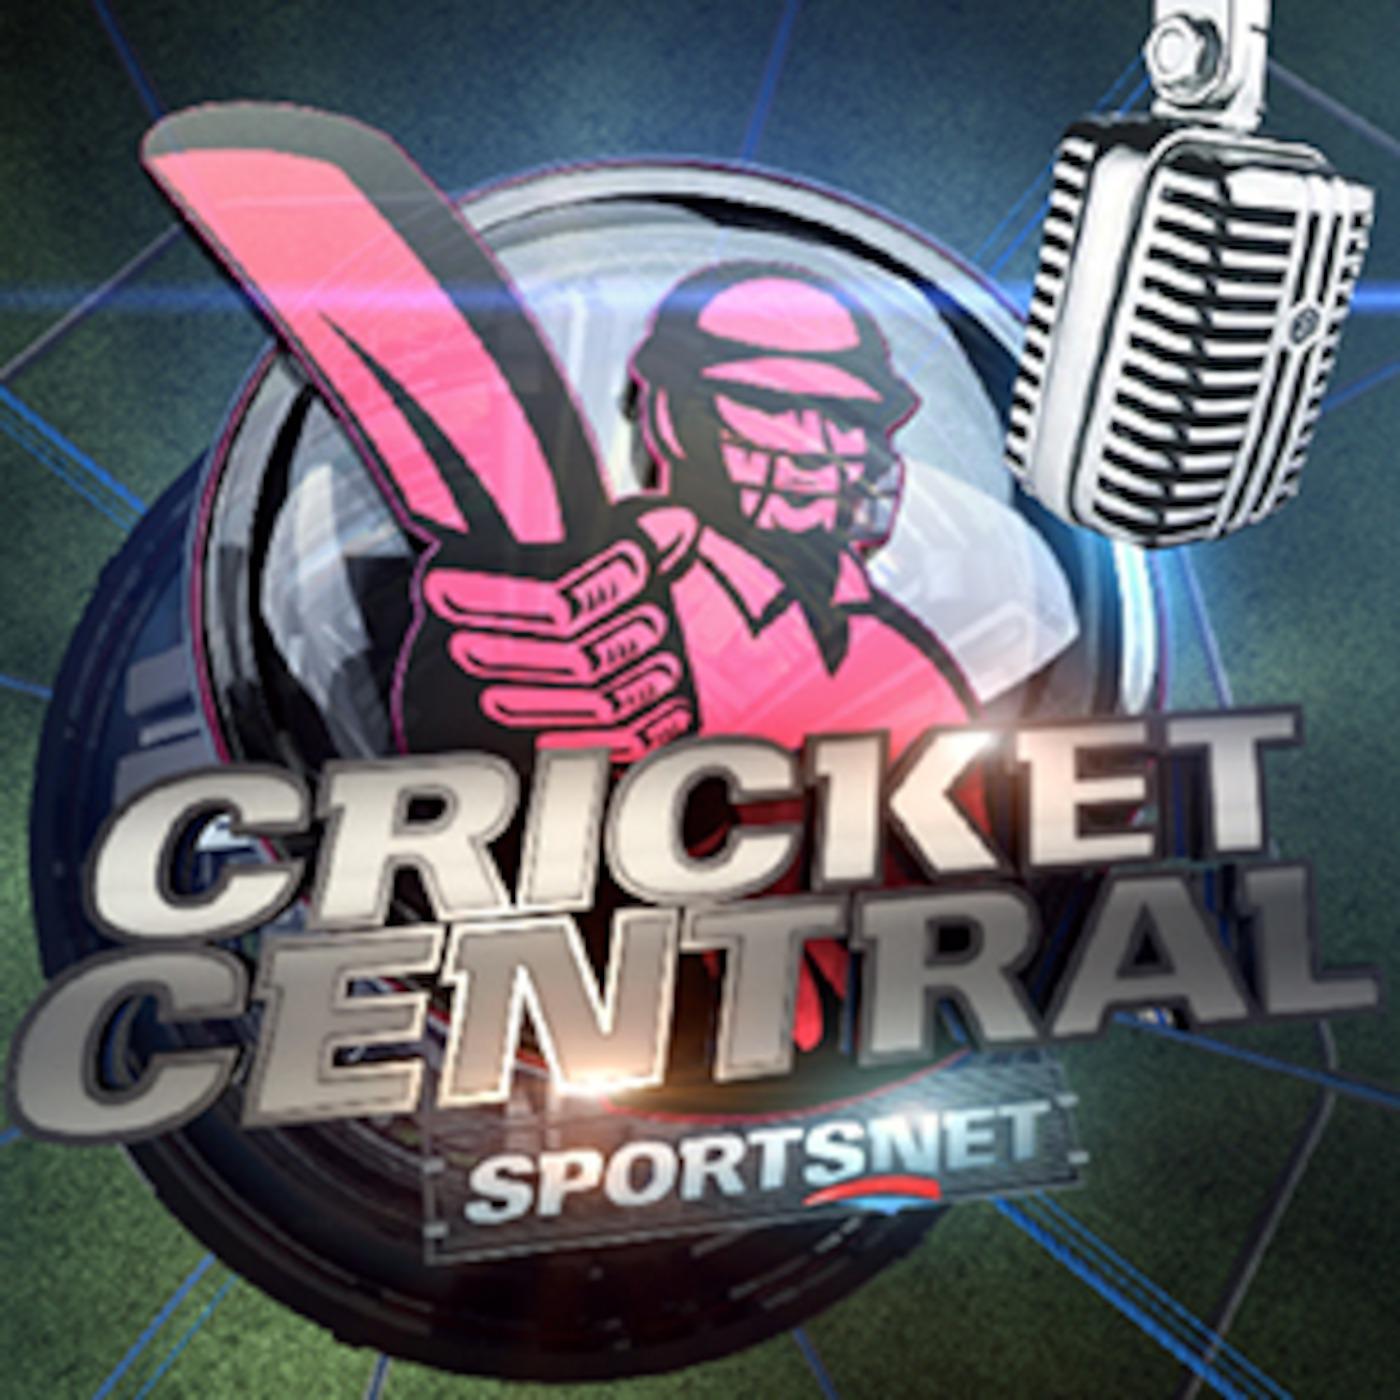 Cricket Central